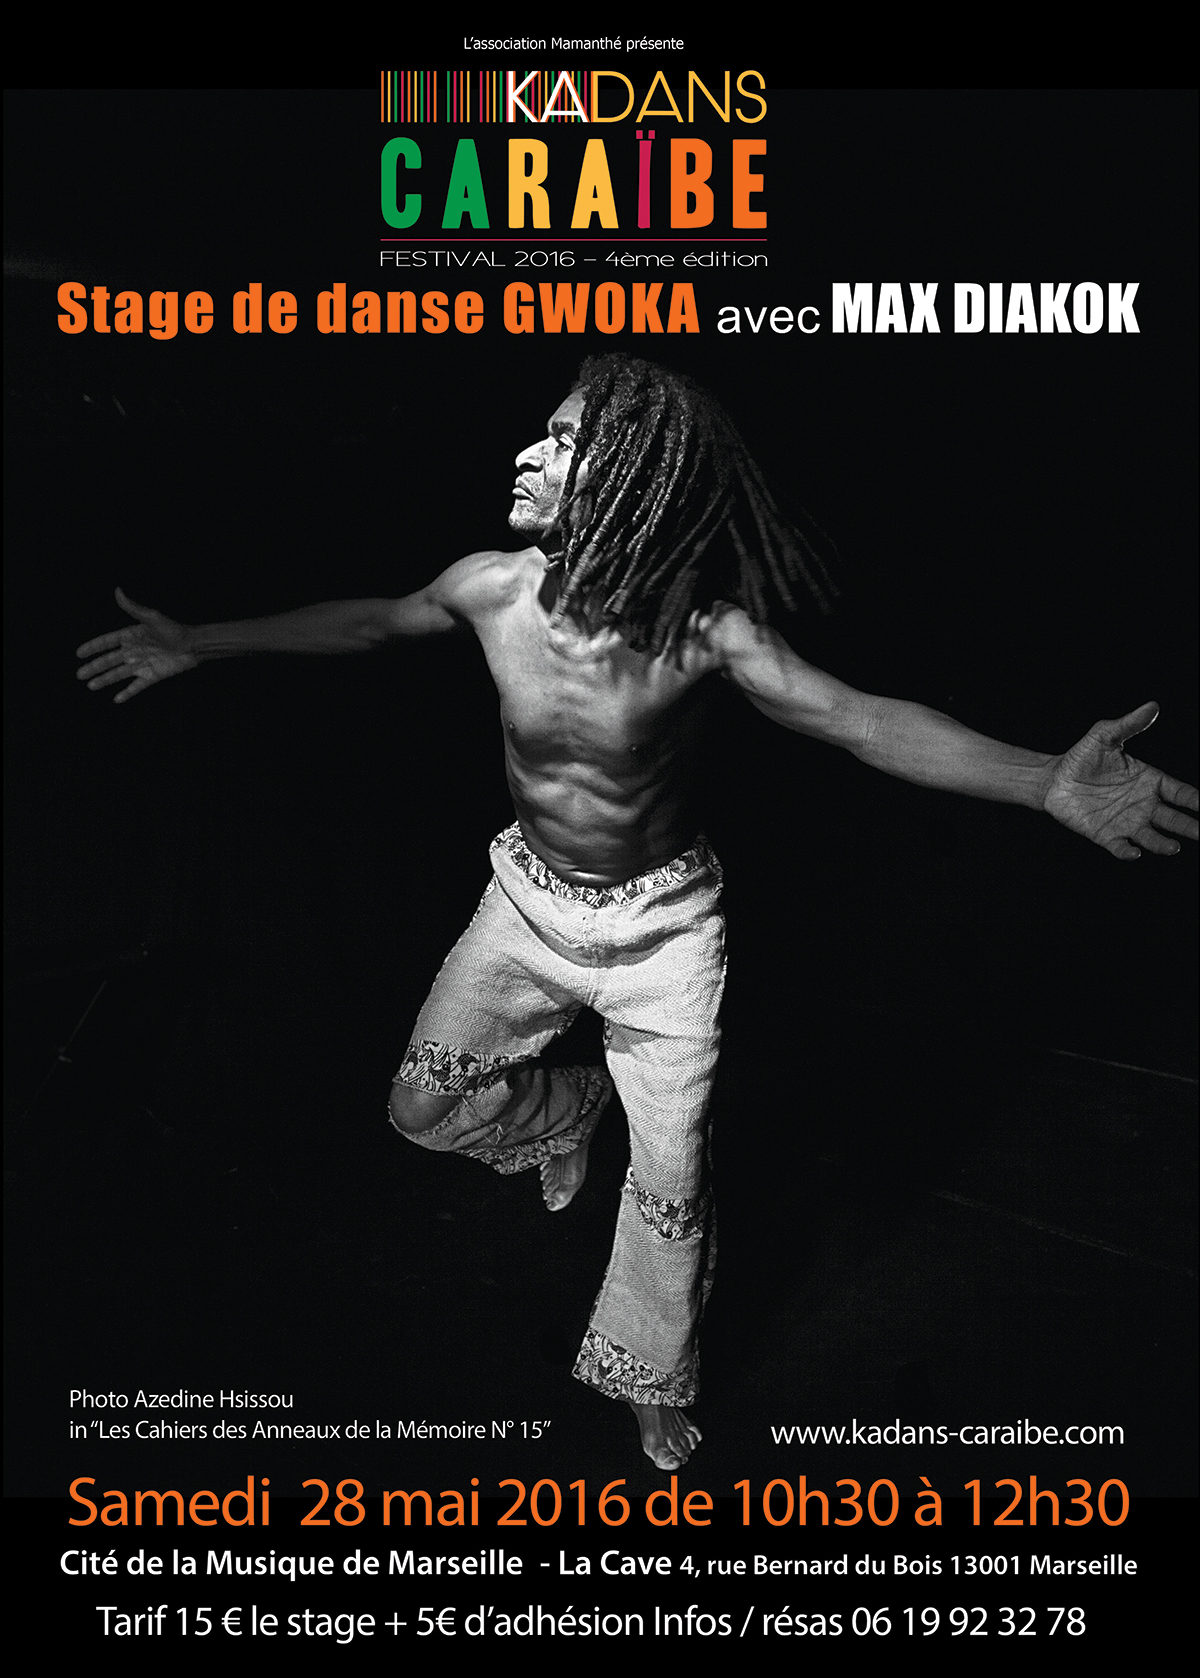 kadans-caraibe-2016-stage-danse-gwoka